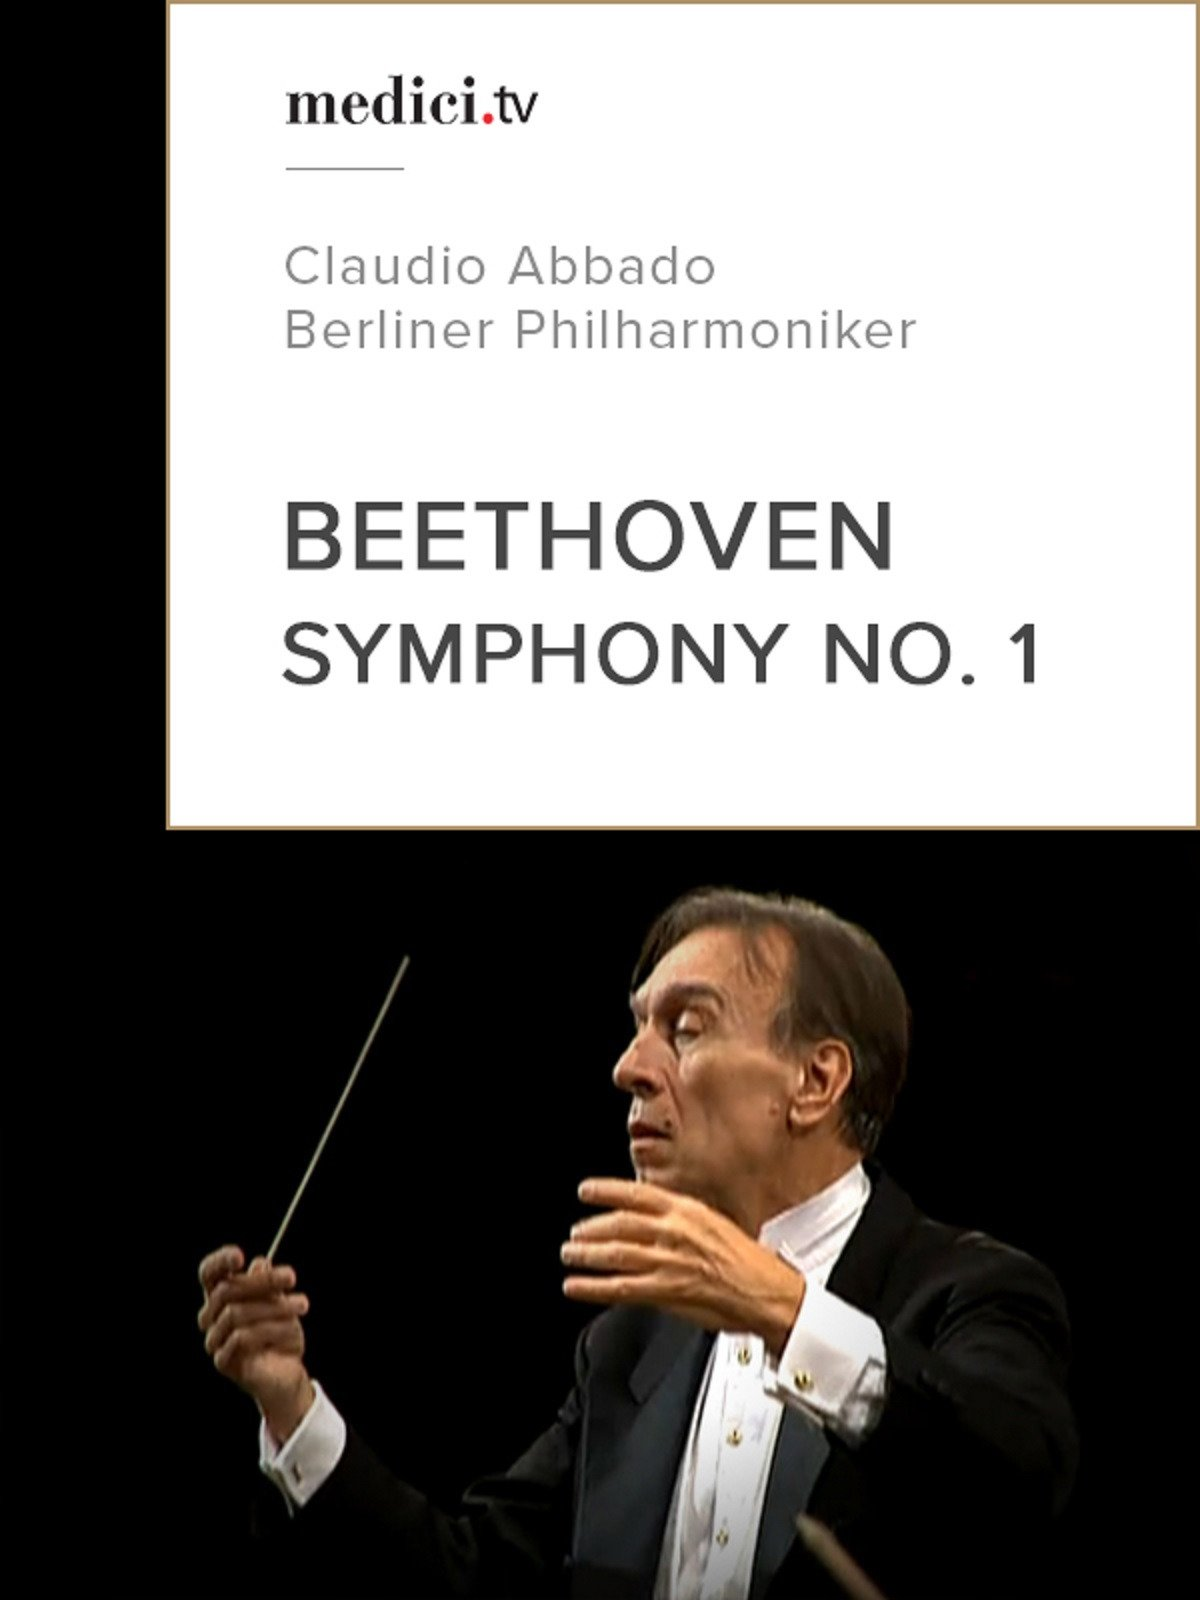 Beethoven, Symphony No. 1